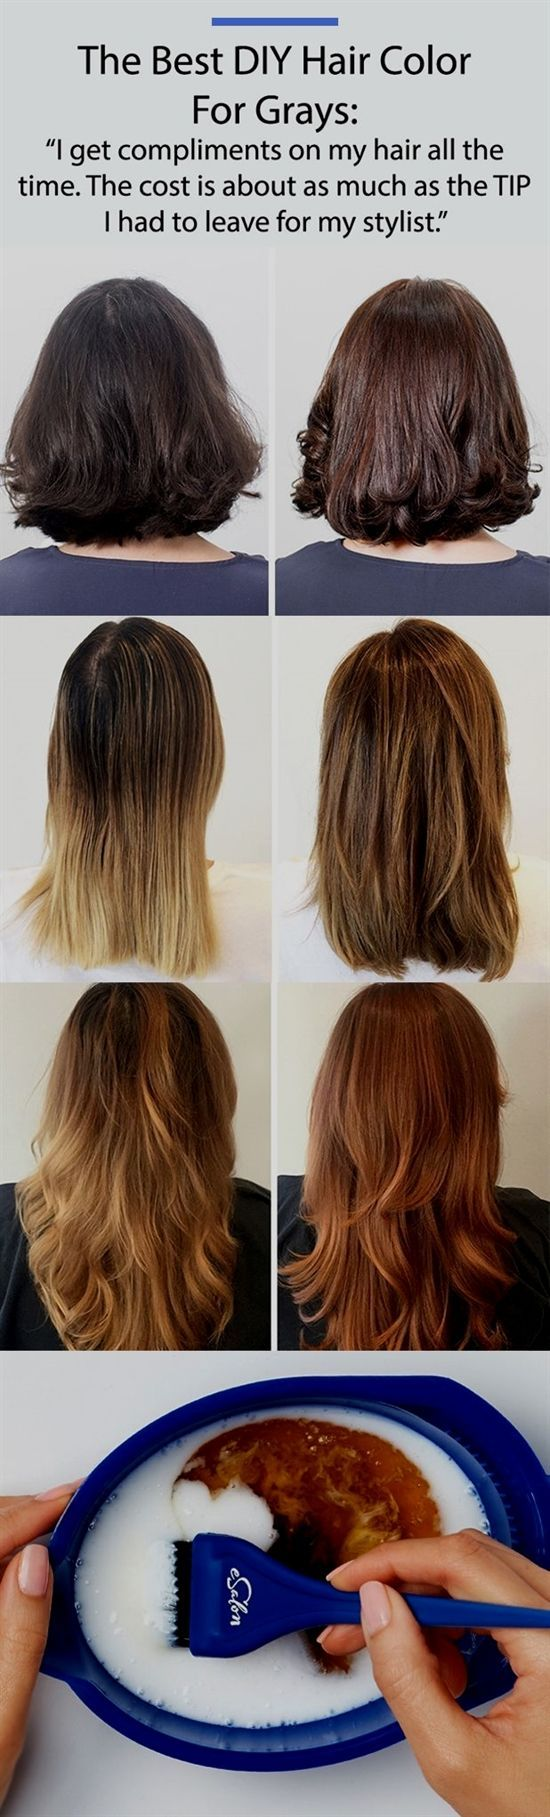 Hair Tutorials For Medium Hair Conair Hair Dryer 1600 Best Hair Cuttery Nea With Images Diy Hair Color Diy Hairstyles Hair Color